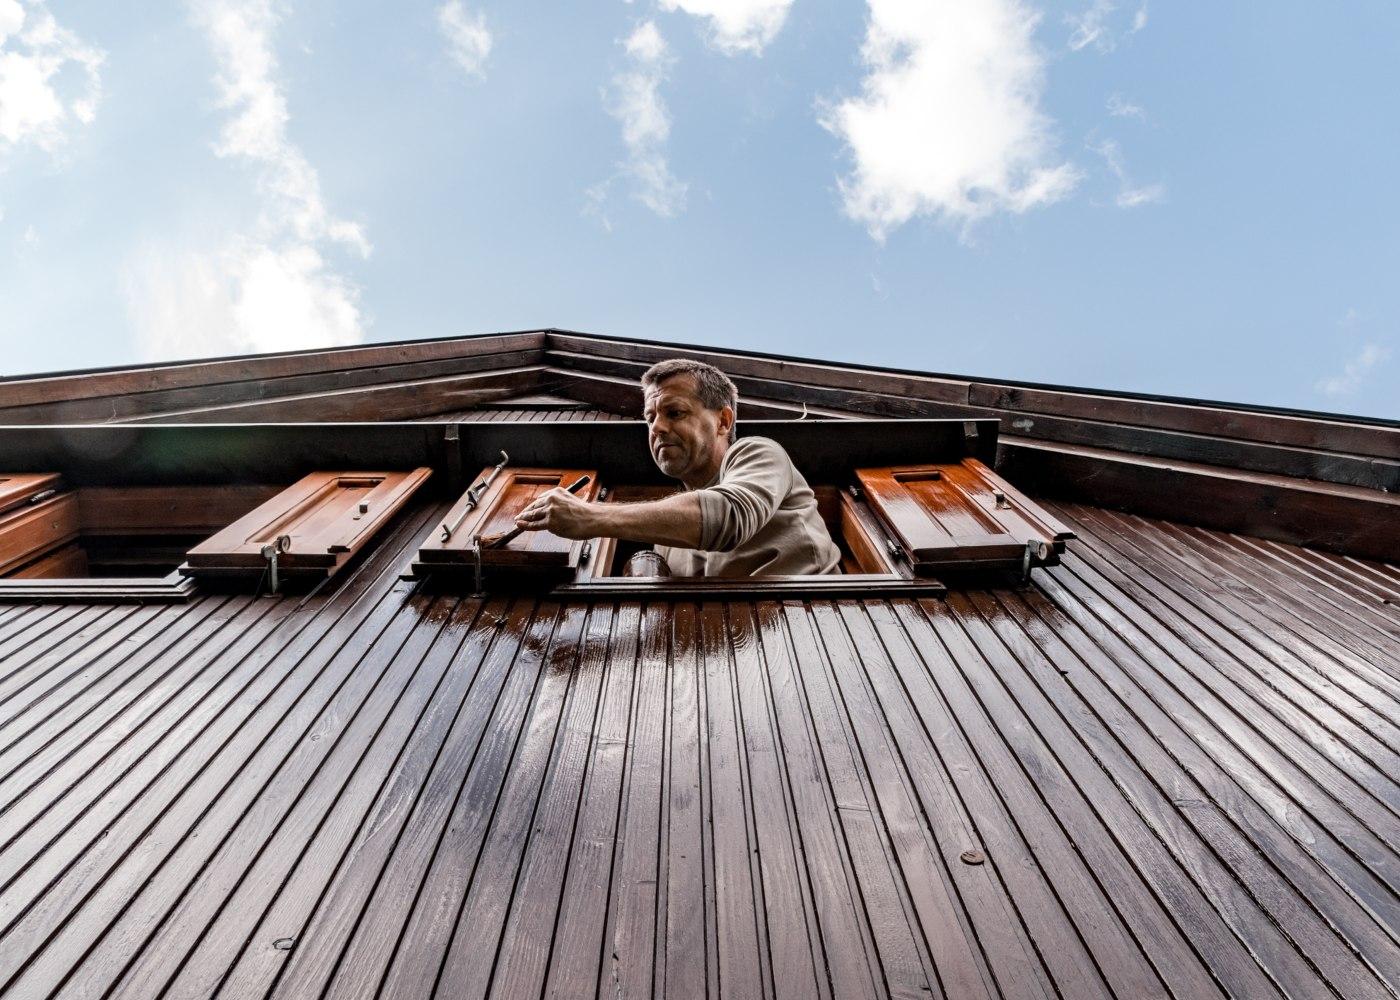 arranjar casa de madeira